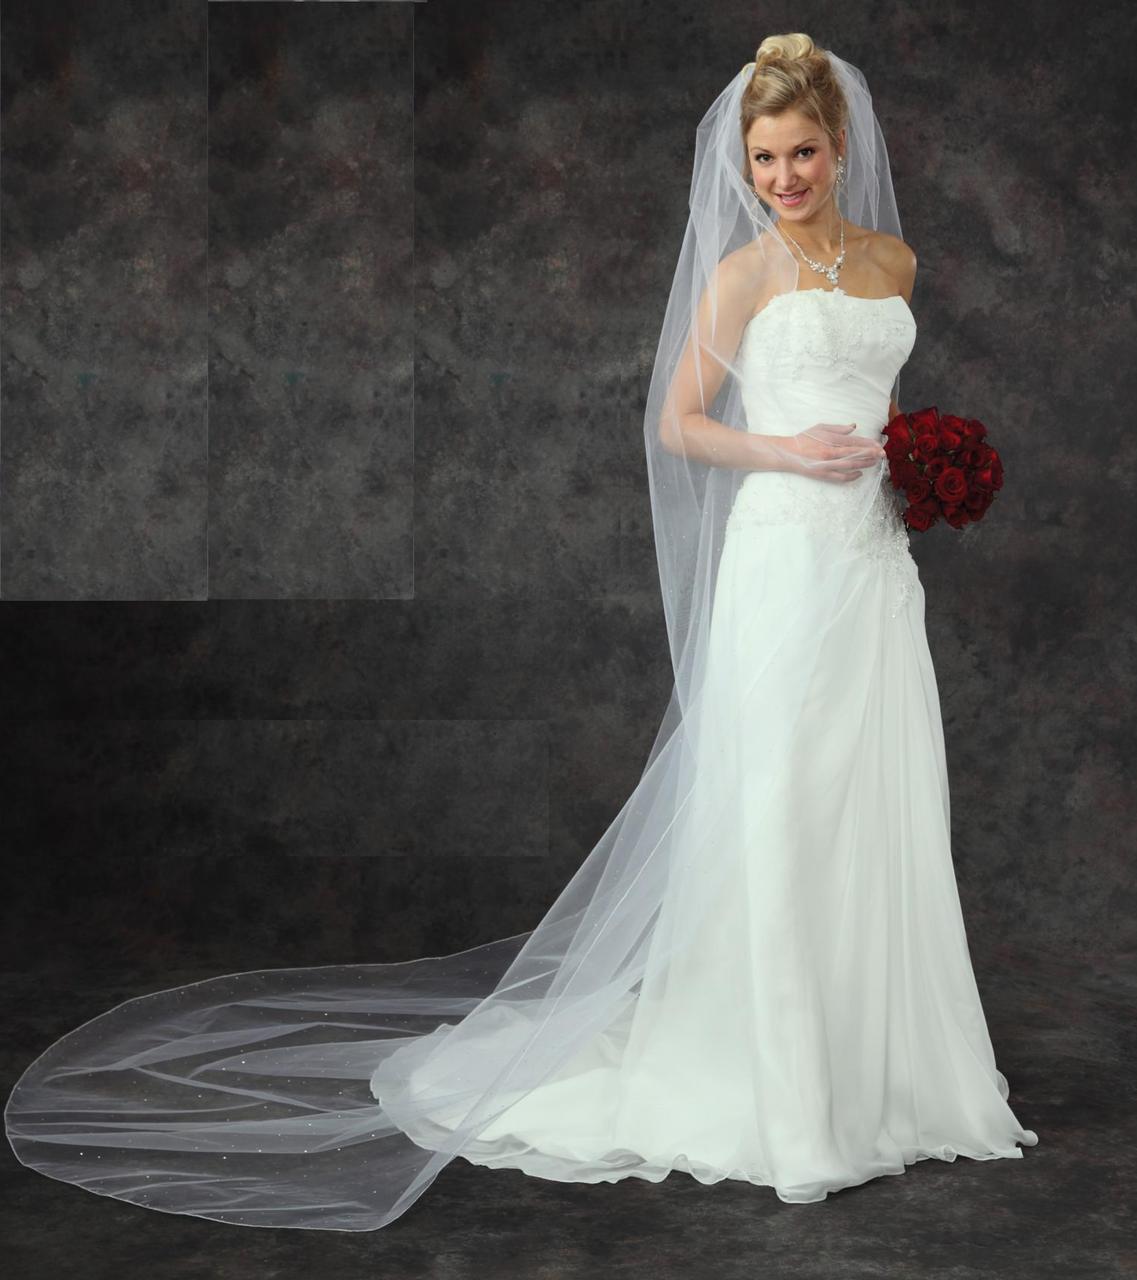 Affordable Elegance Bridal Cathedral Length Rhinestone